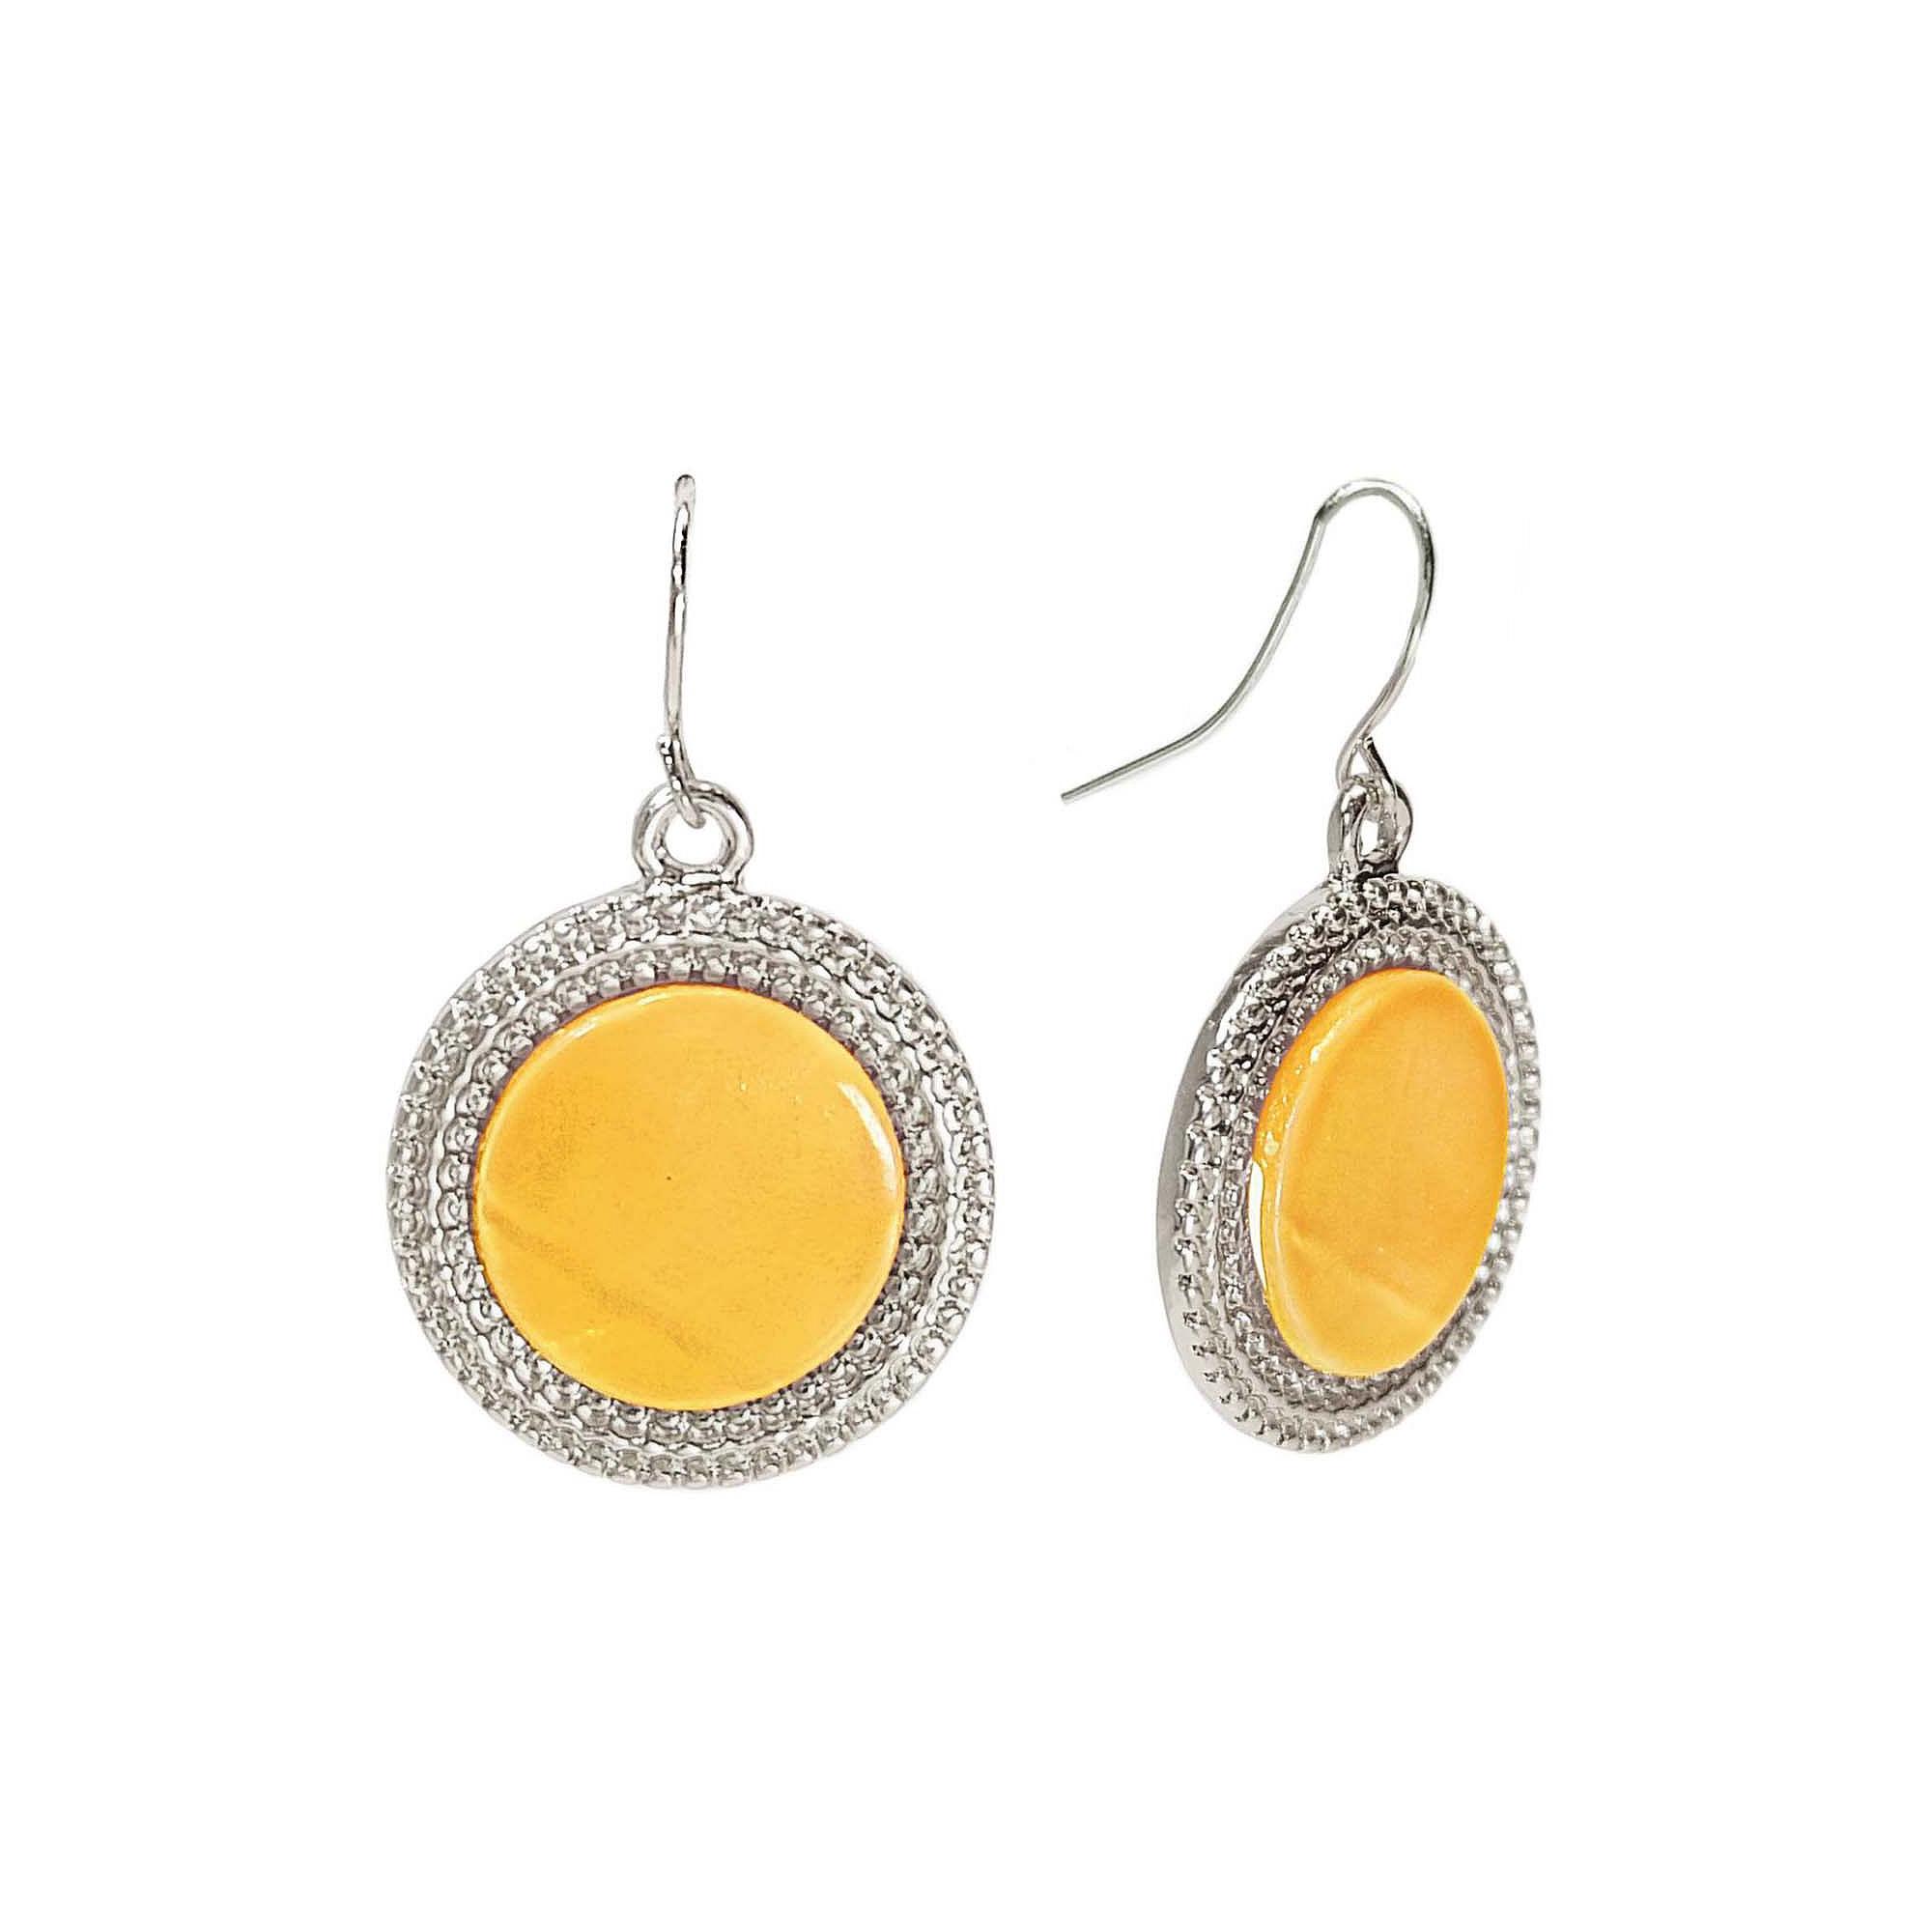 Studio by Carol Dauplaise Silver-Tone Yellow Disc Drop Earrings